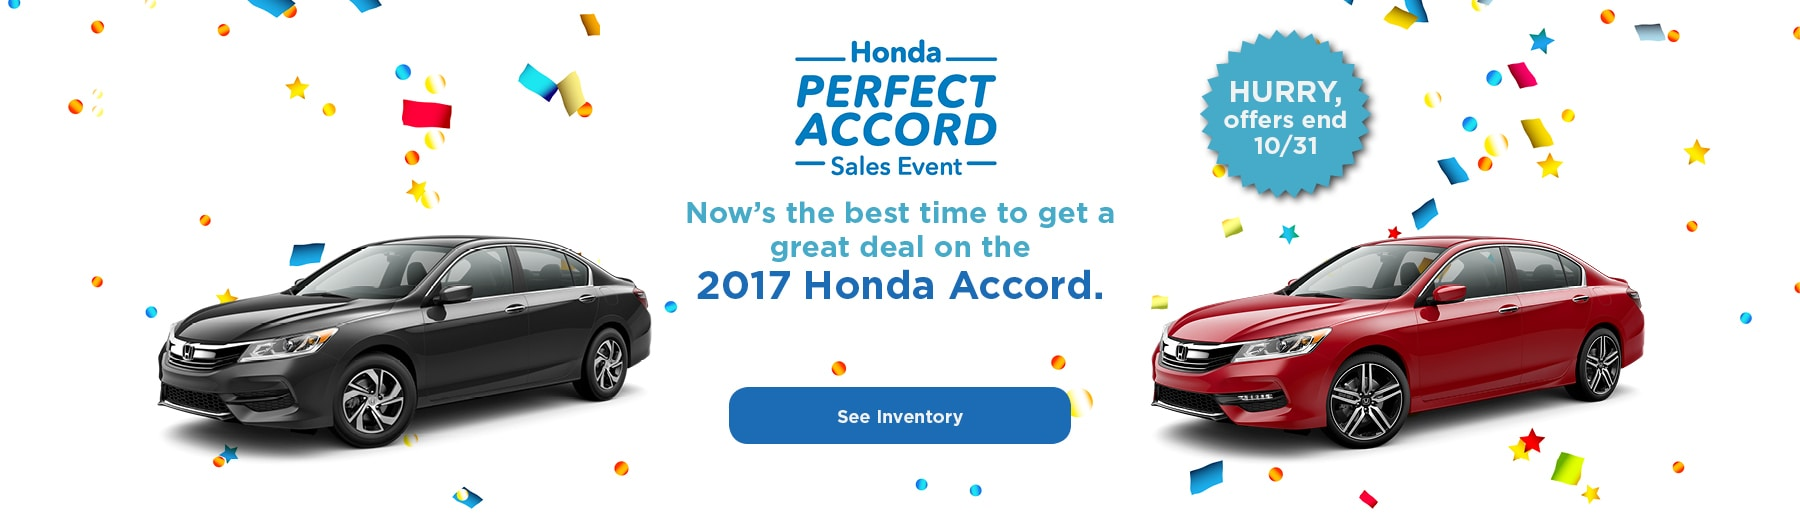 Honda dealership san antonio tx new used honda cars suvs at gunn honda